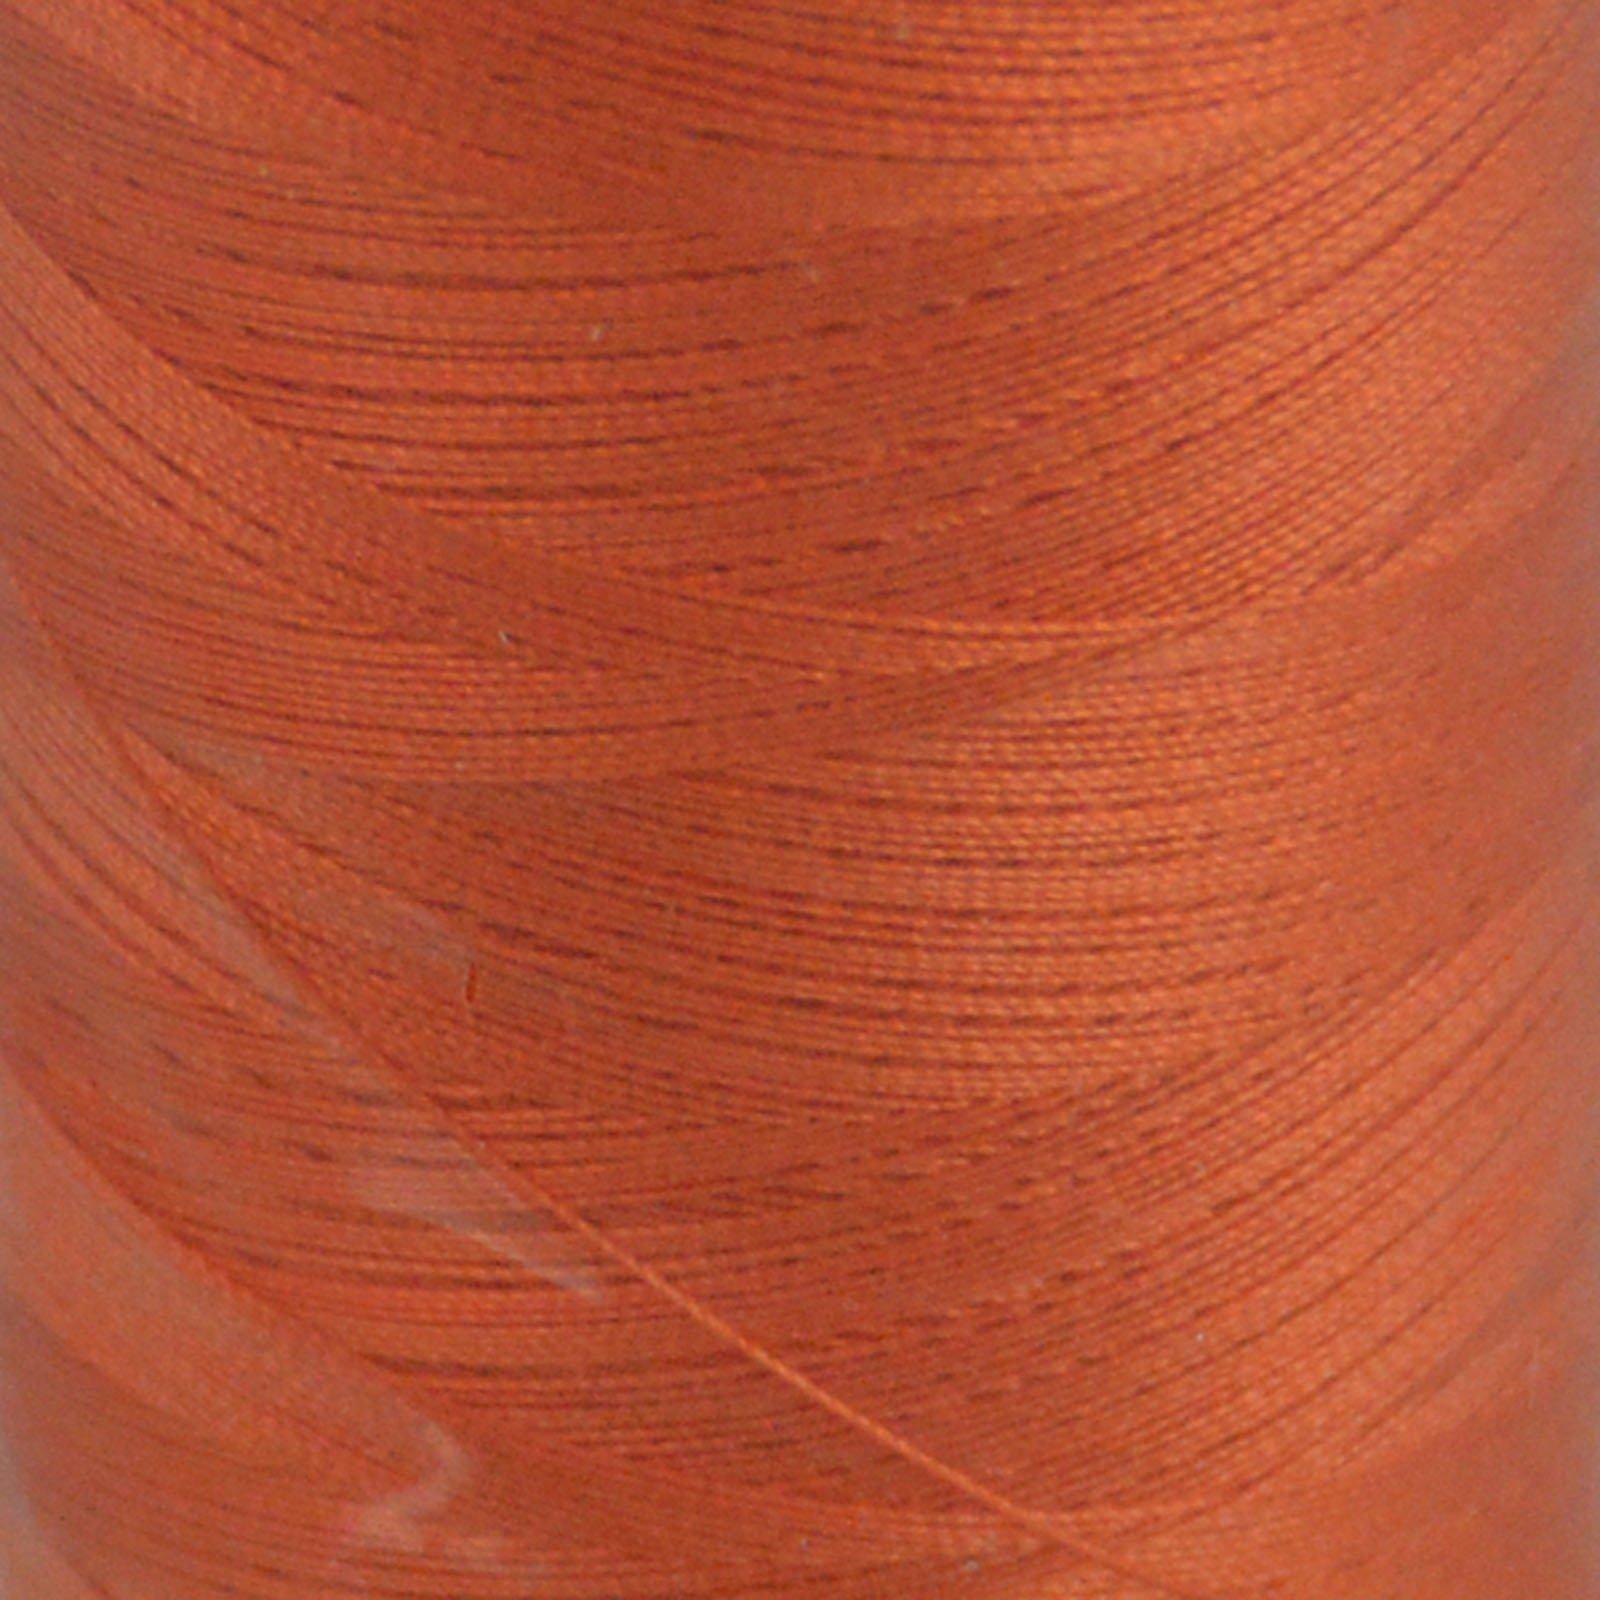 # 1154 Dusty Orange